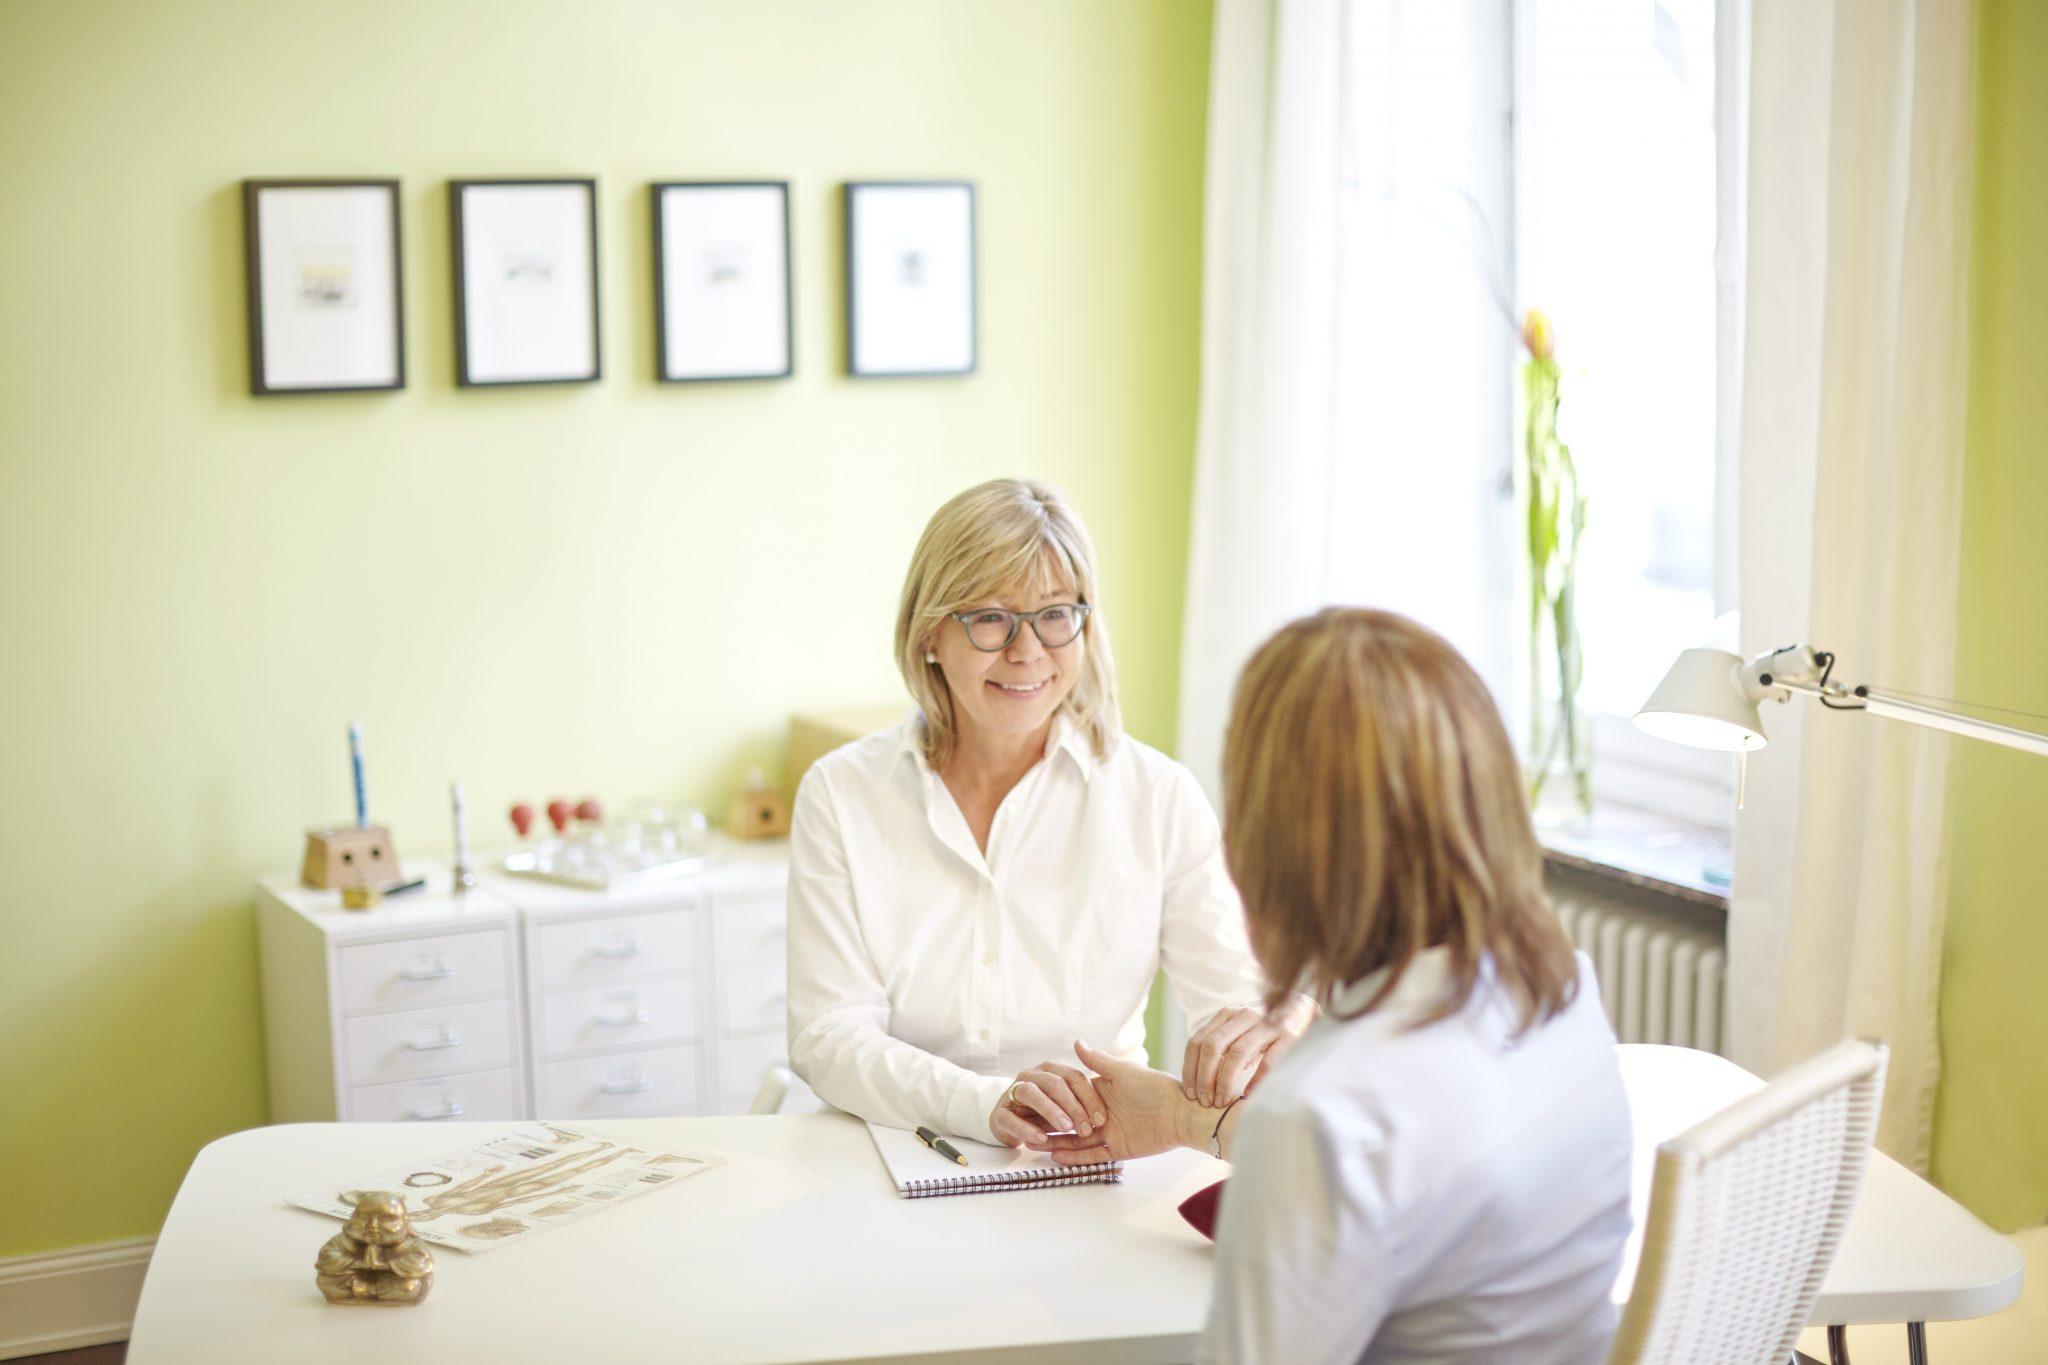 Annette Gausepohl, Heilpraktikerin in Bonn, TCM Praxis - Patientengespräch